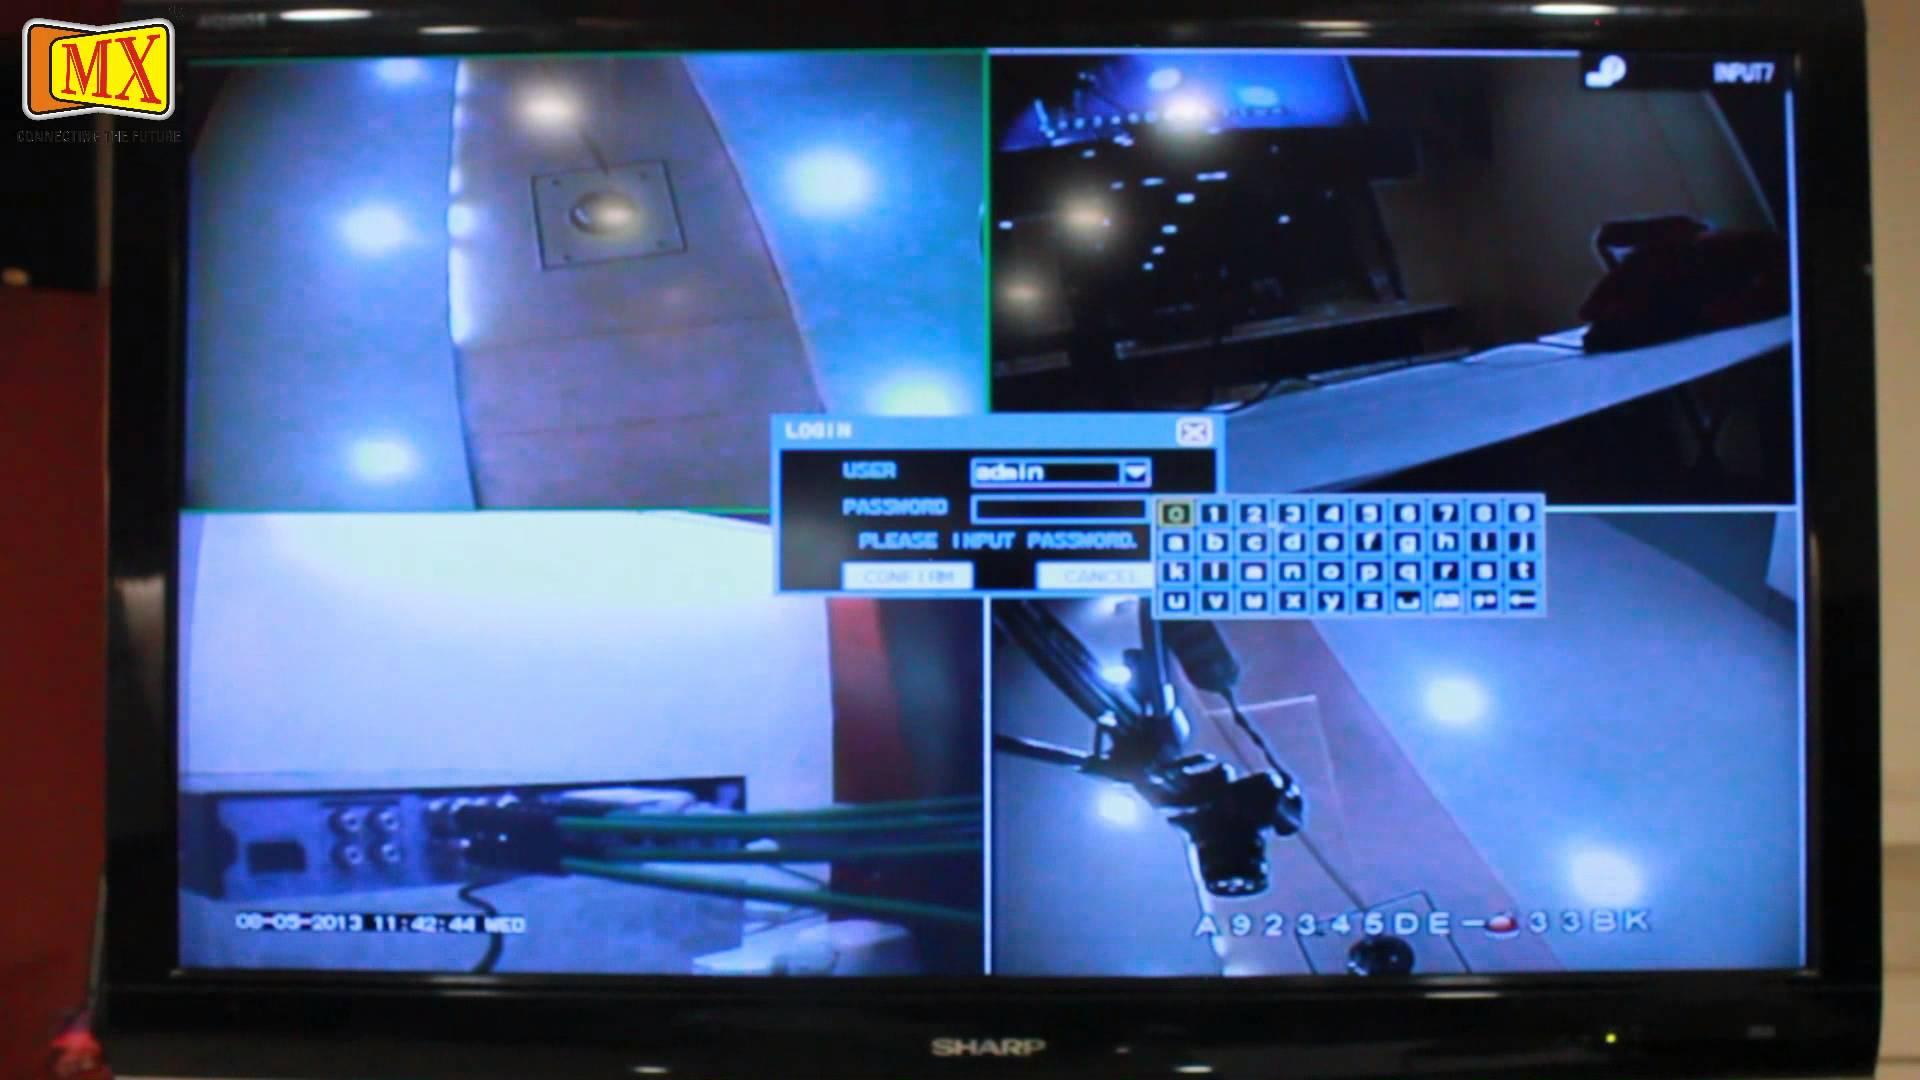 Digital Edge Led Screens Prolights Alphapix3 Led Screen